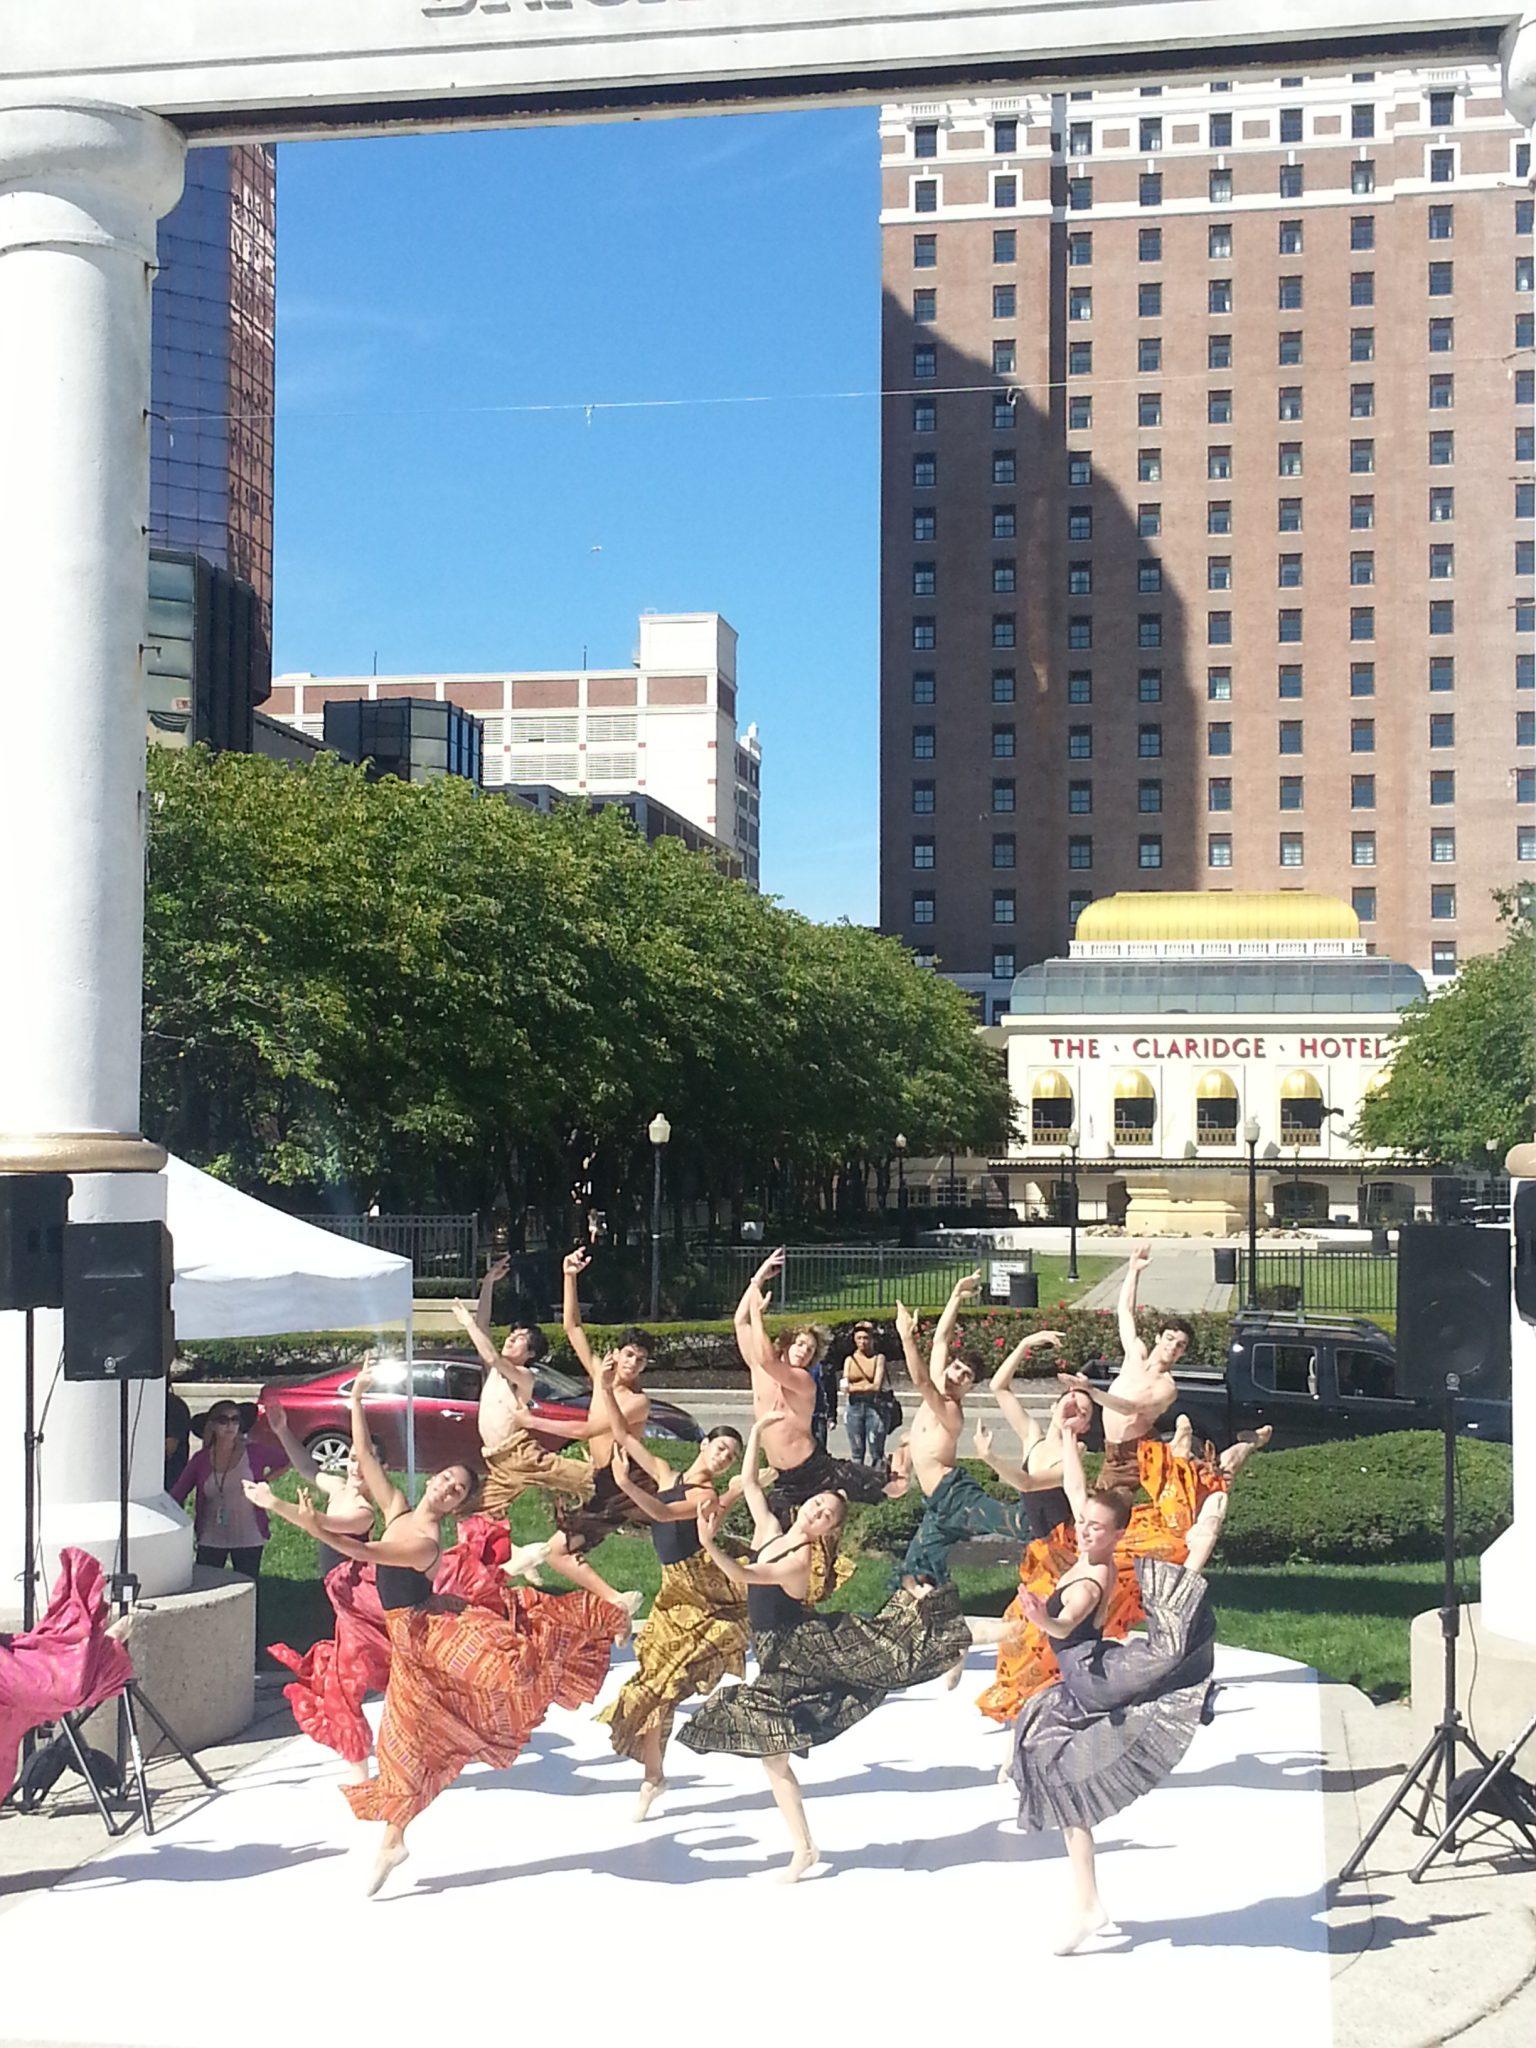 2014 Atlantic City Boardwalk Art Show - Atlantic City Ballet